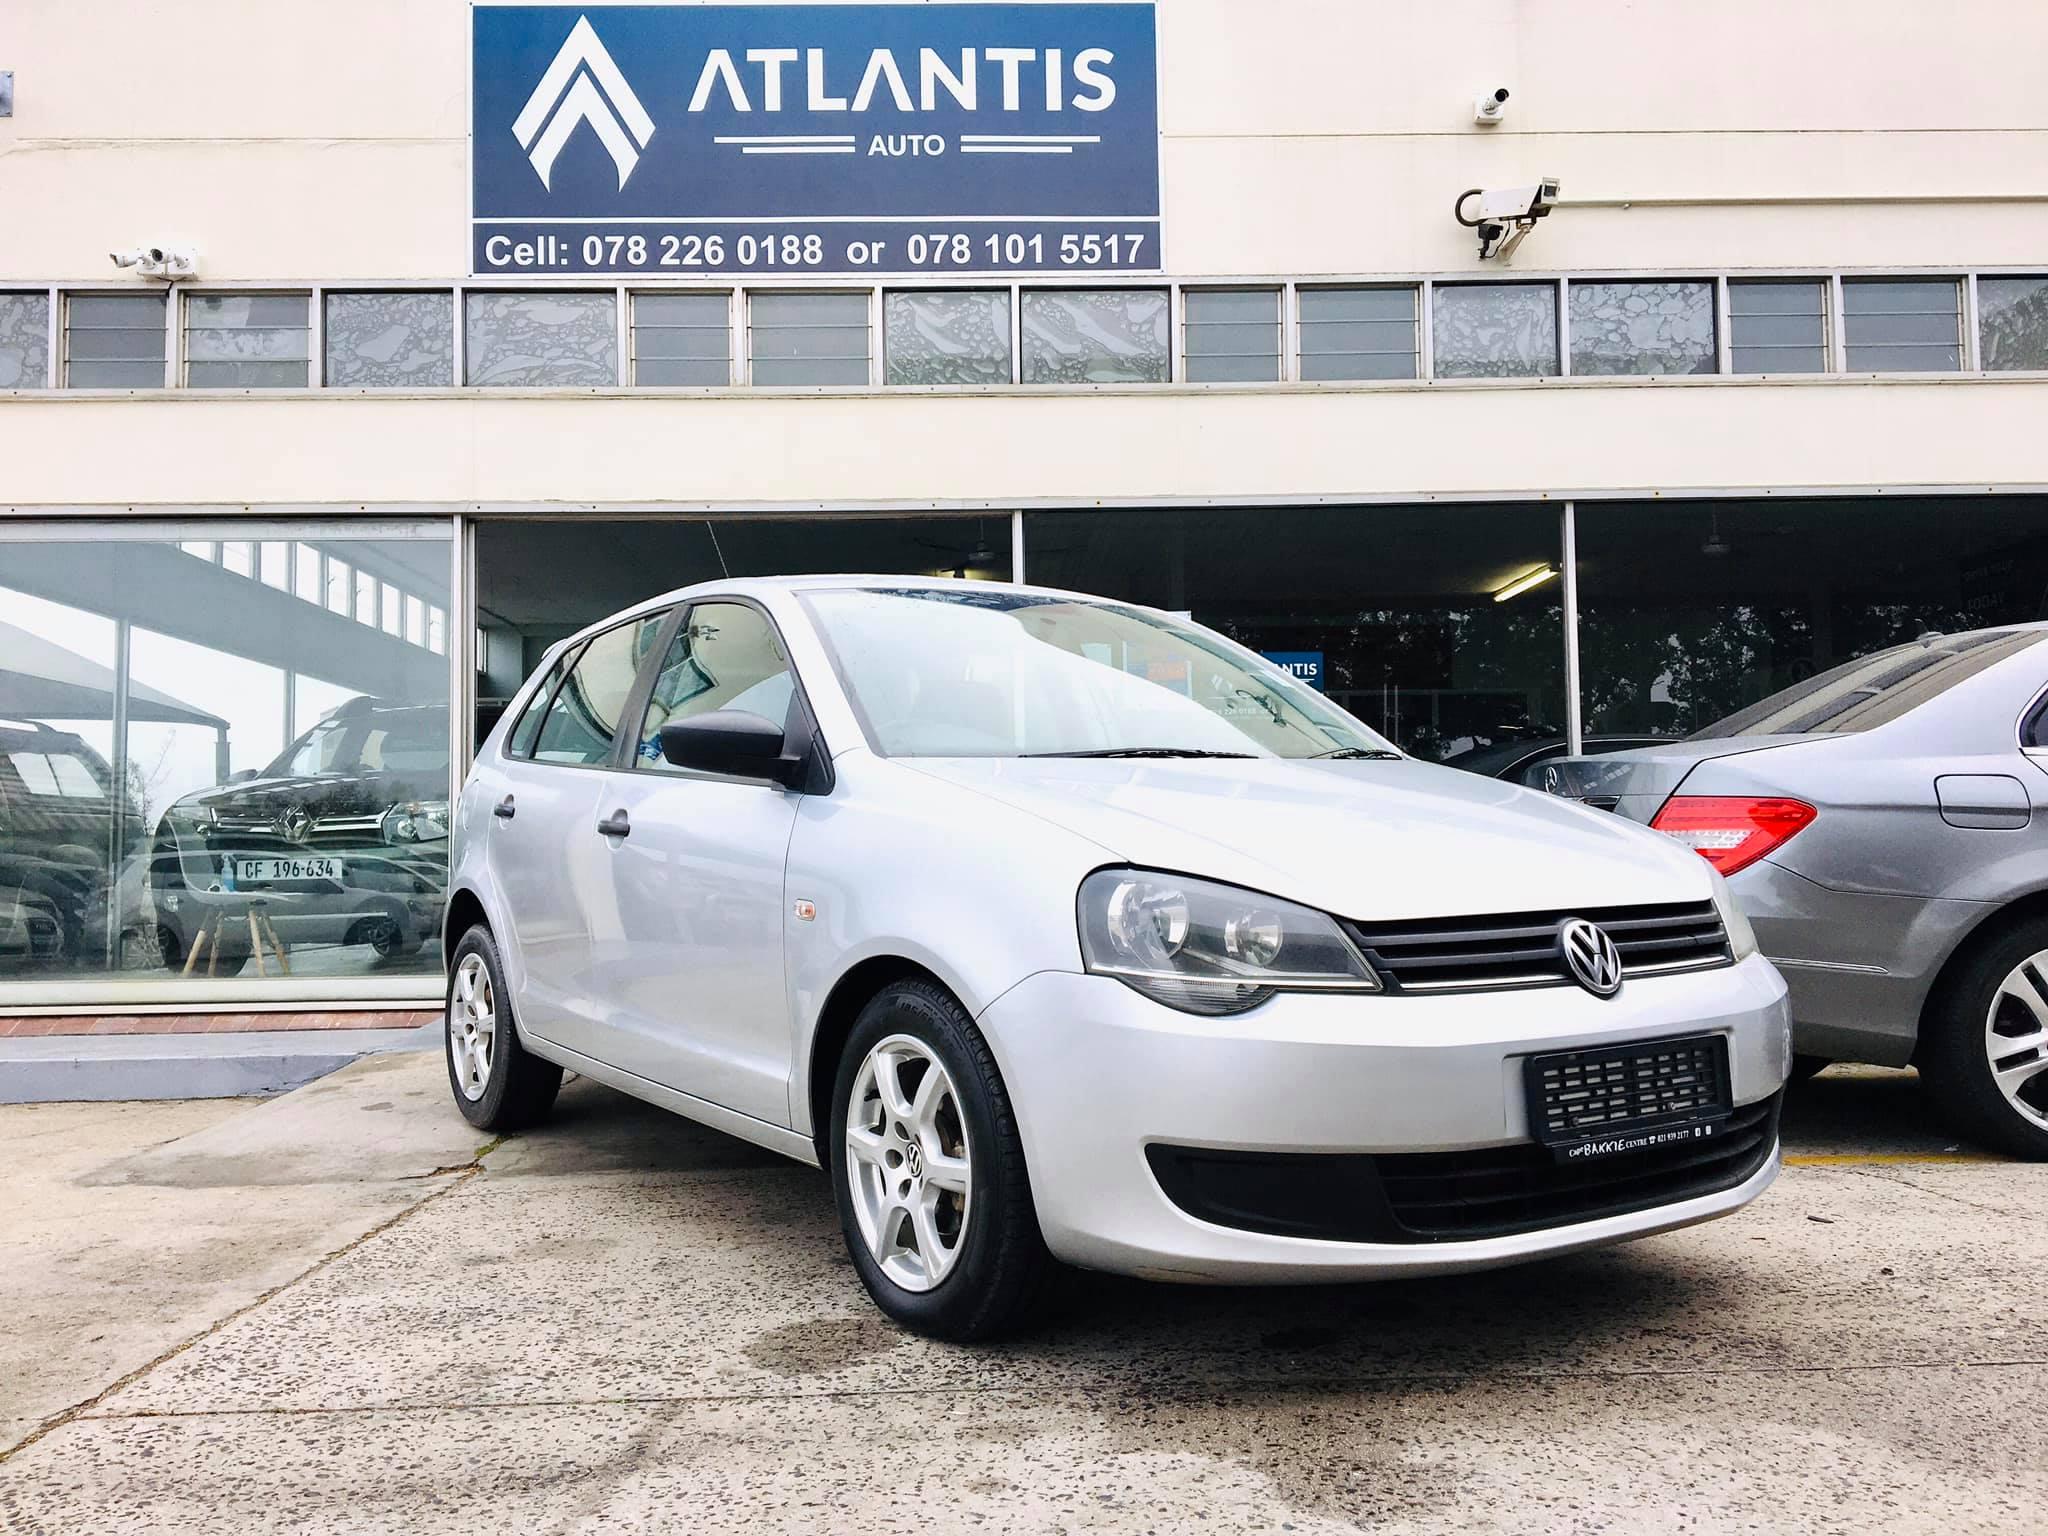 In need of new wheels ?Atlantis Auto Sales